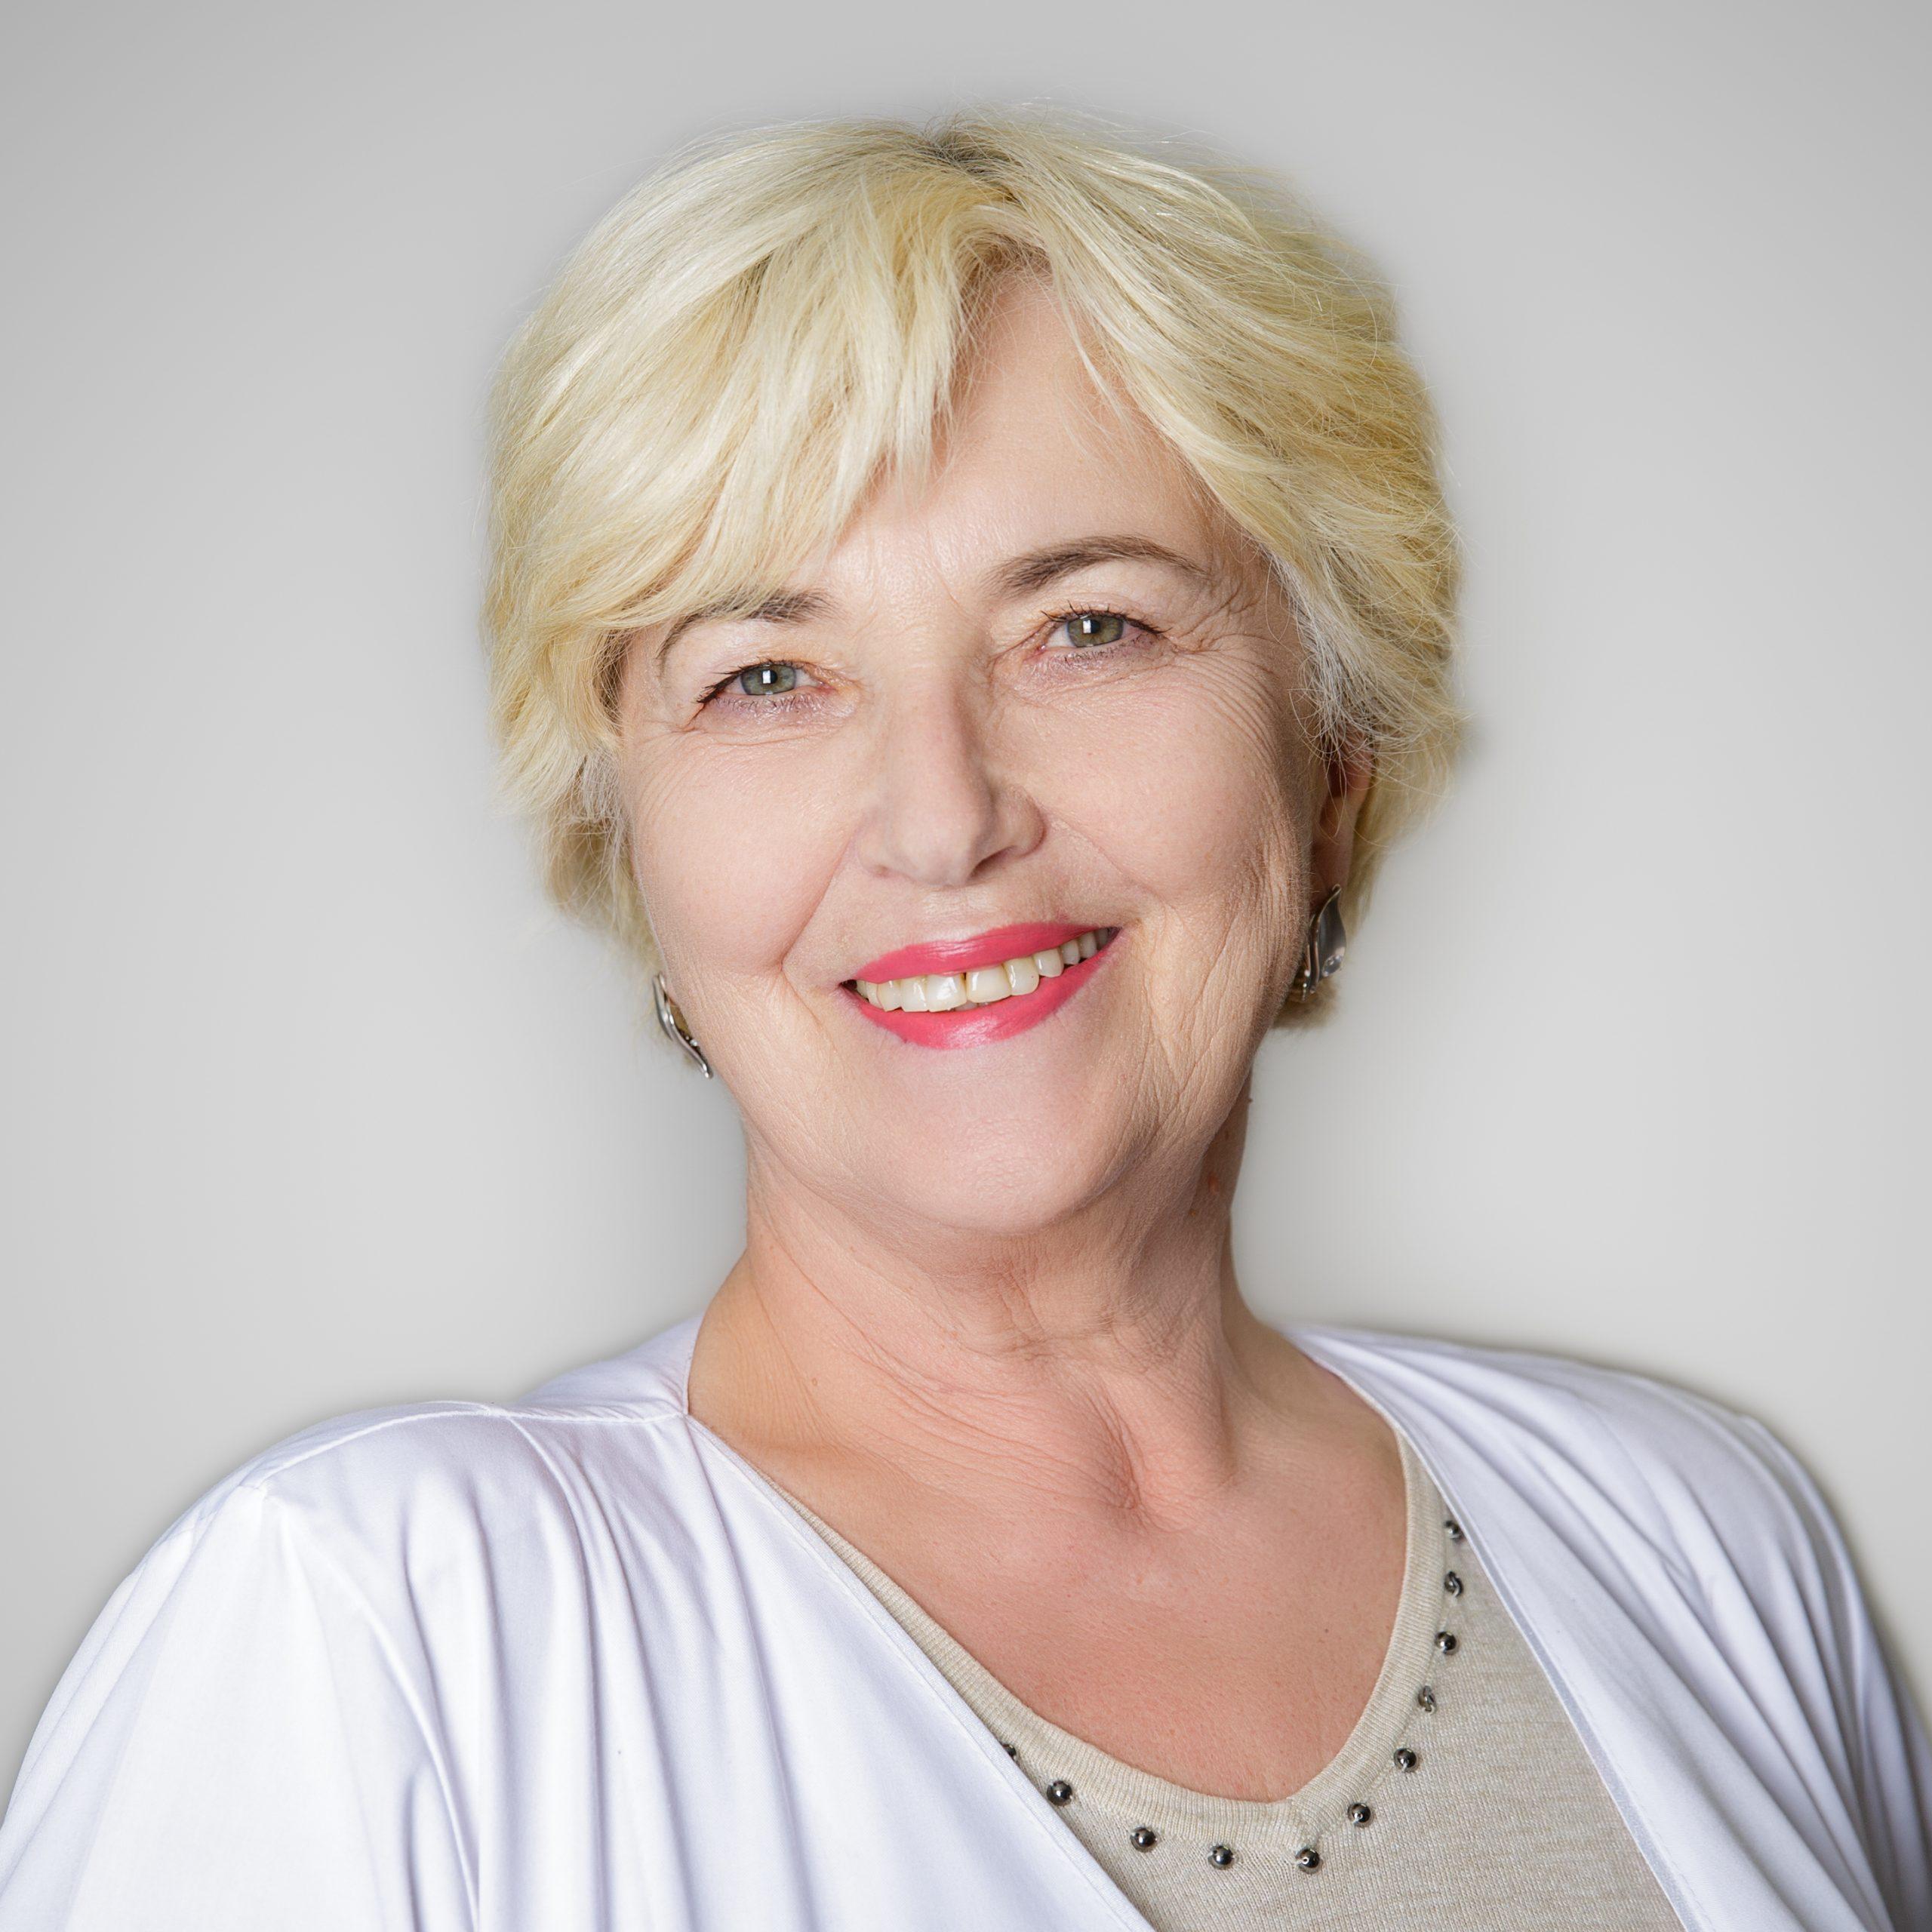 Sabina Karosienė